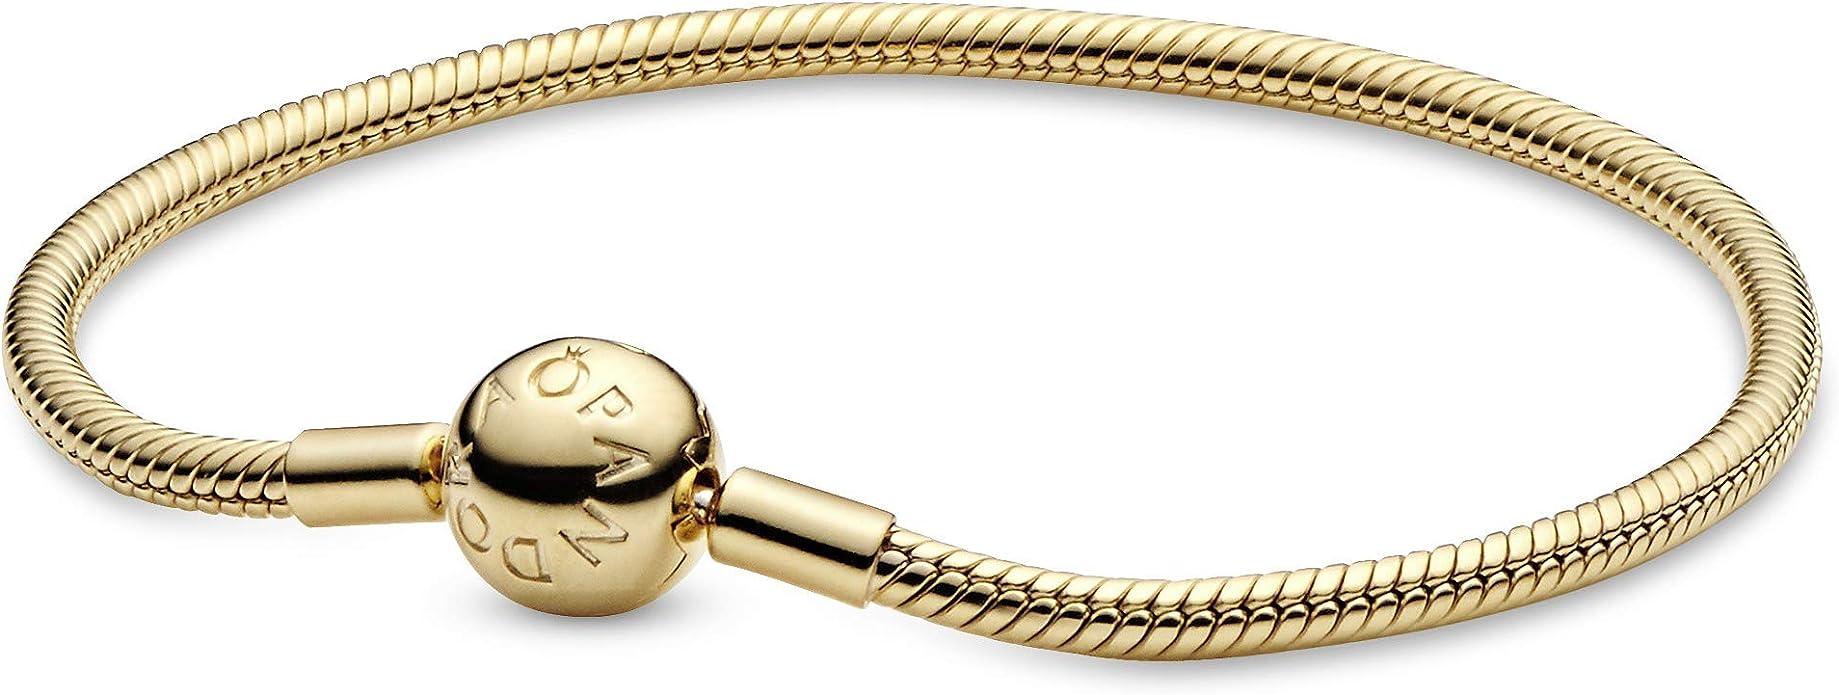 PANDORA Jewelry Snake Chain Shine Bracelet